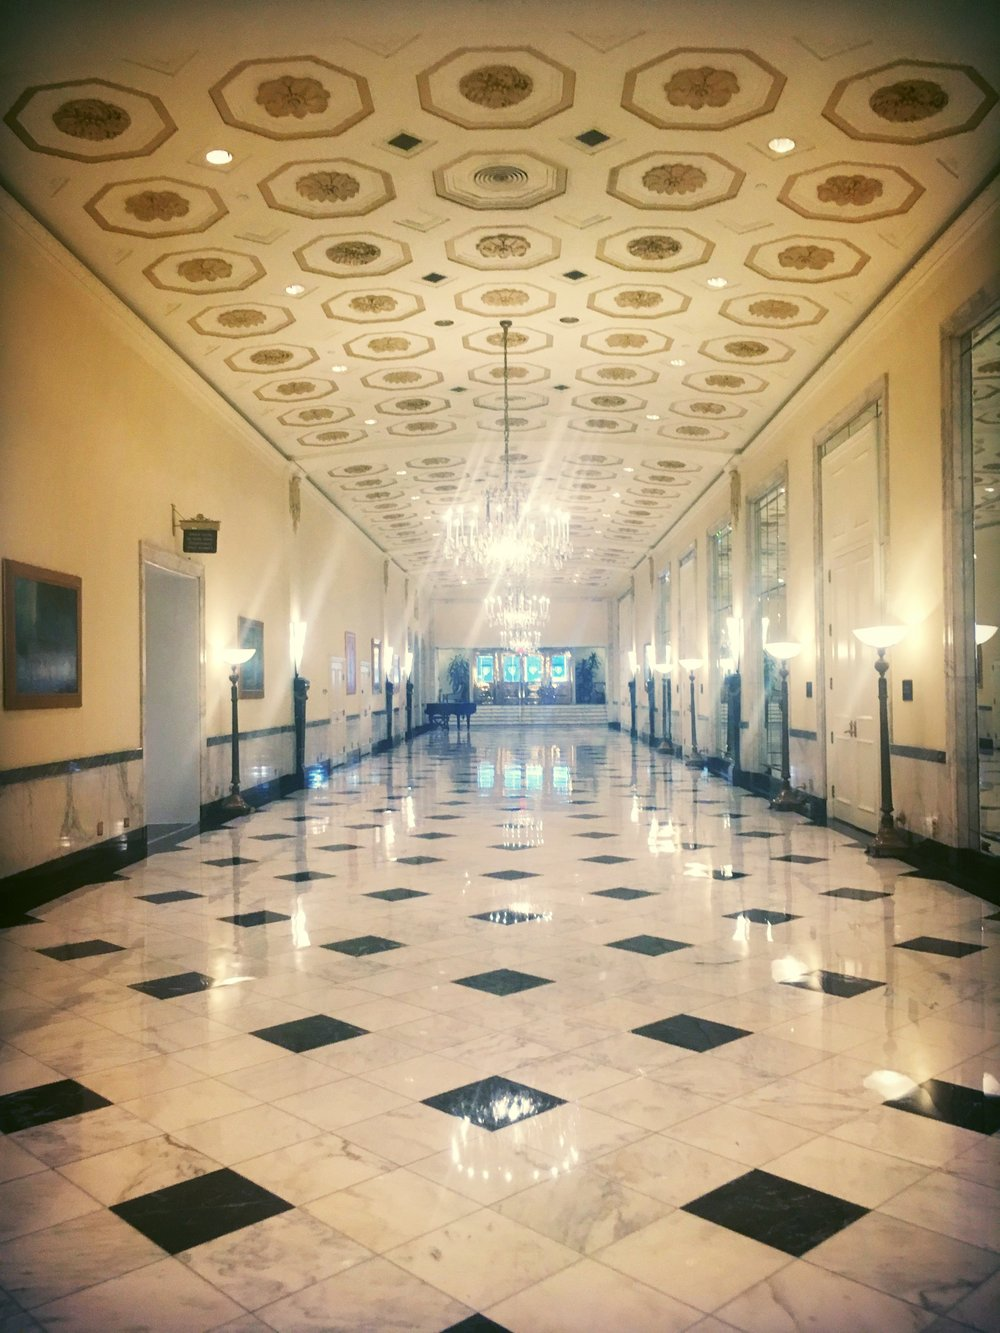 Inside the Mayflower Hotel in Washington, D.C.